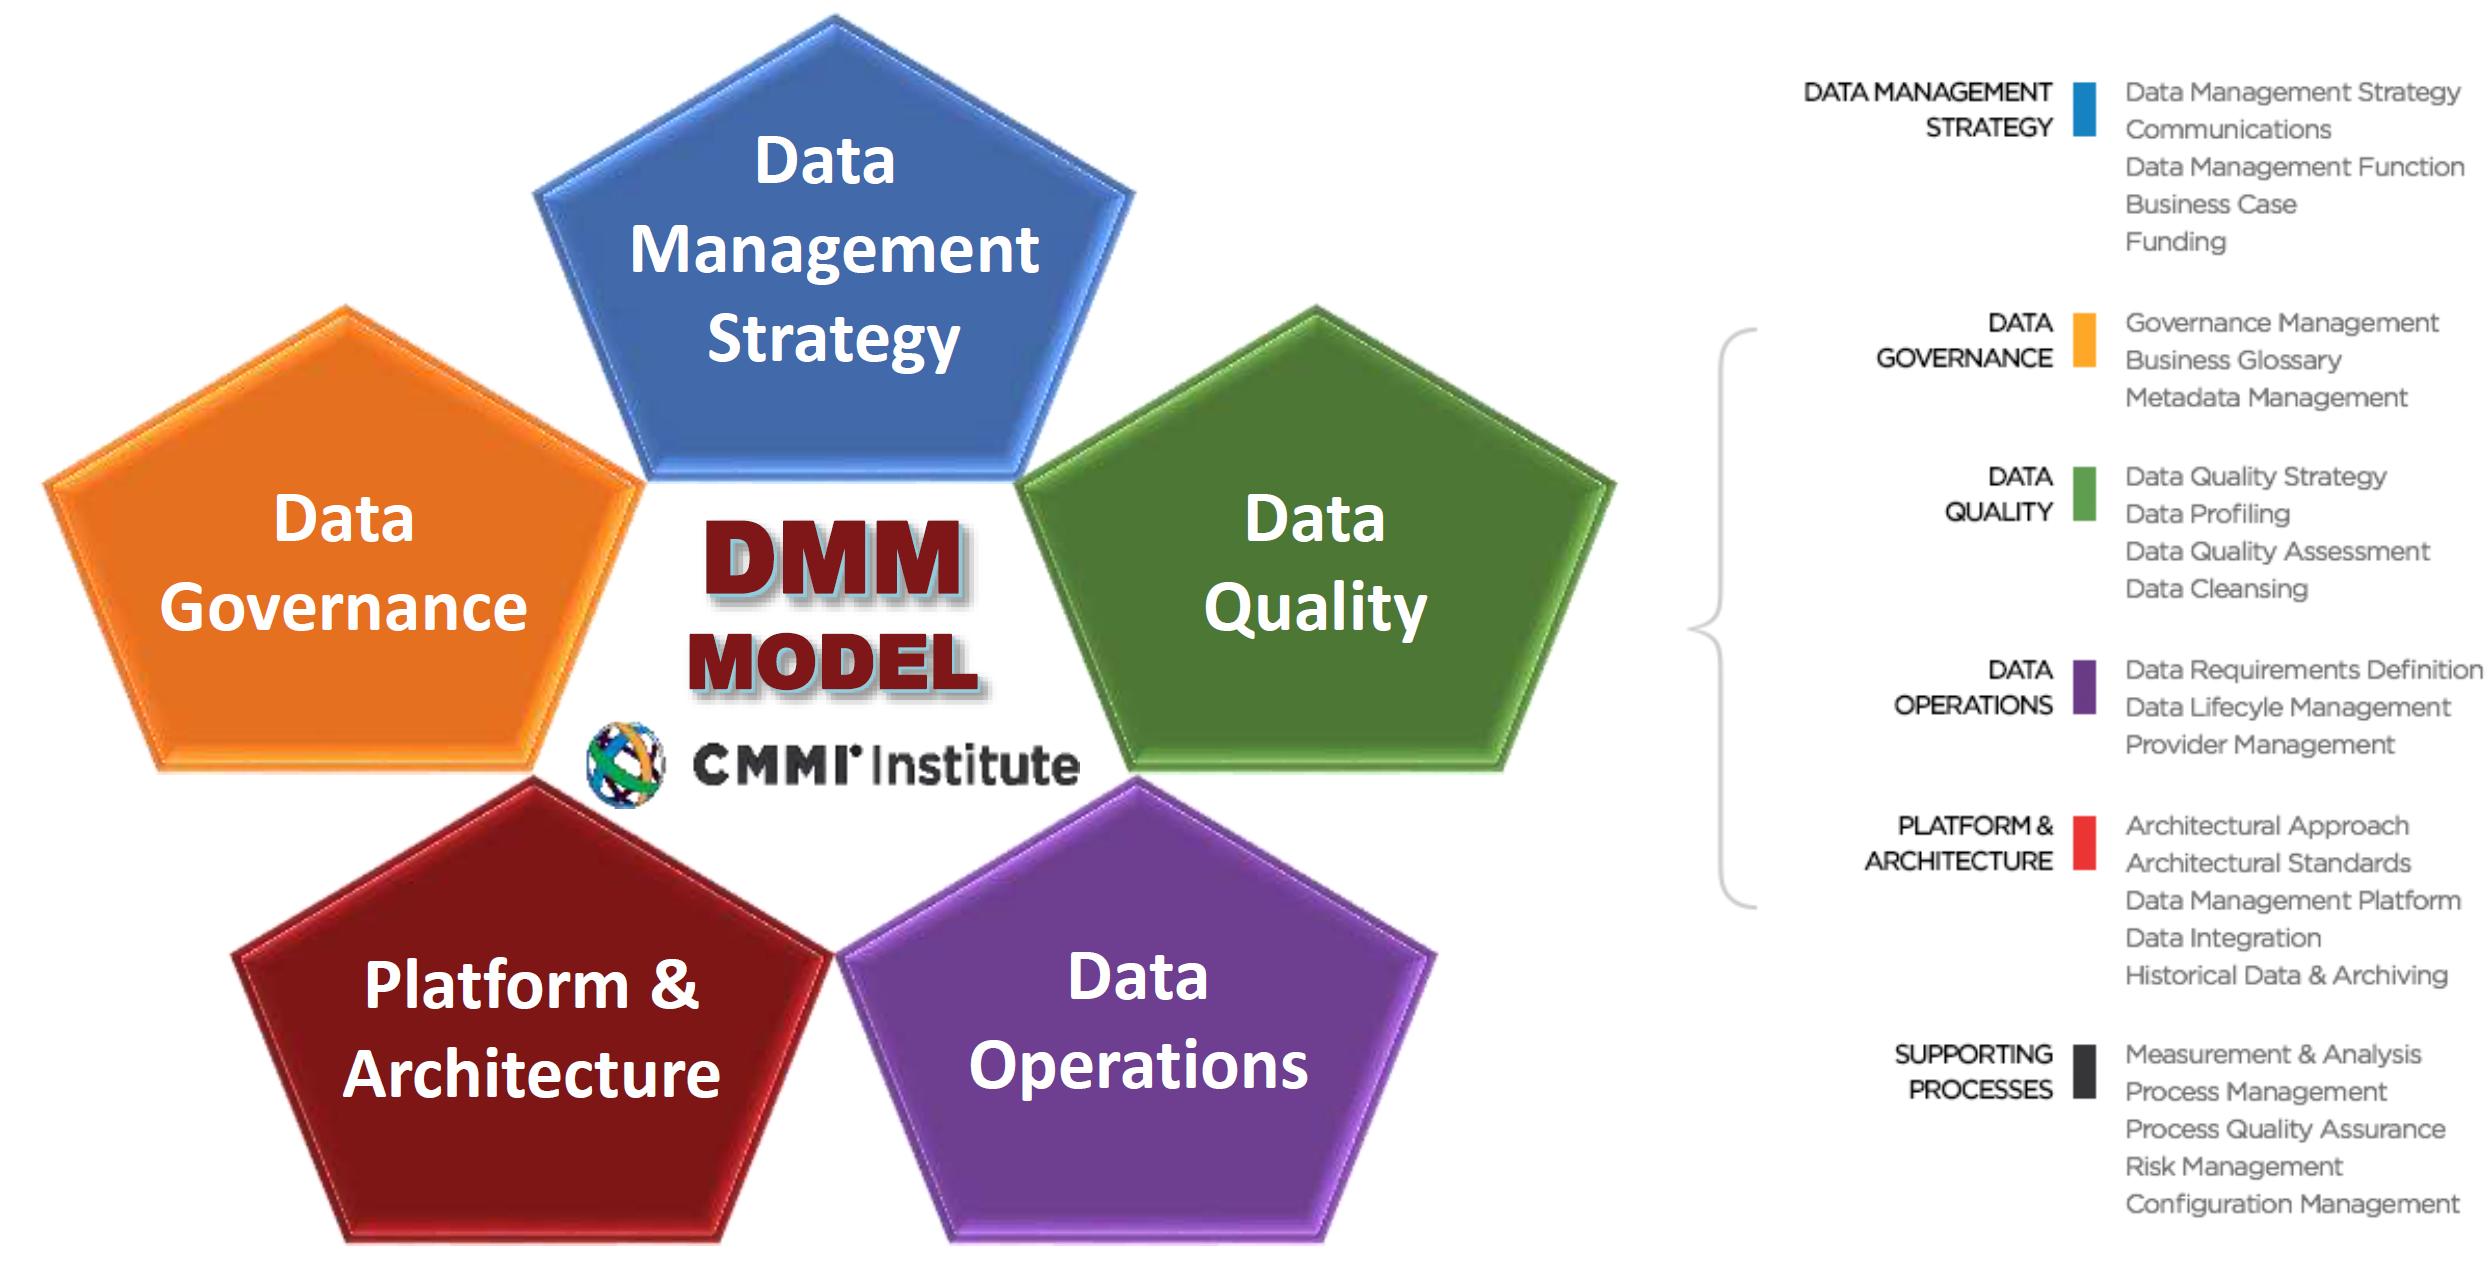 Cmmi Dmm Model on Business Process Diagram